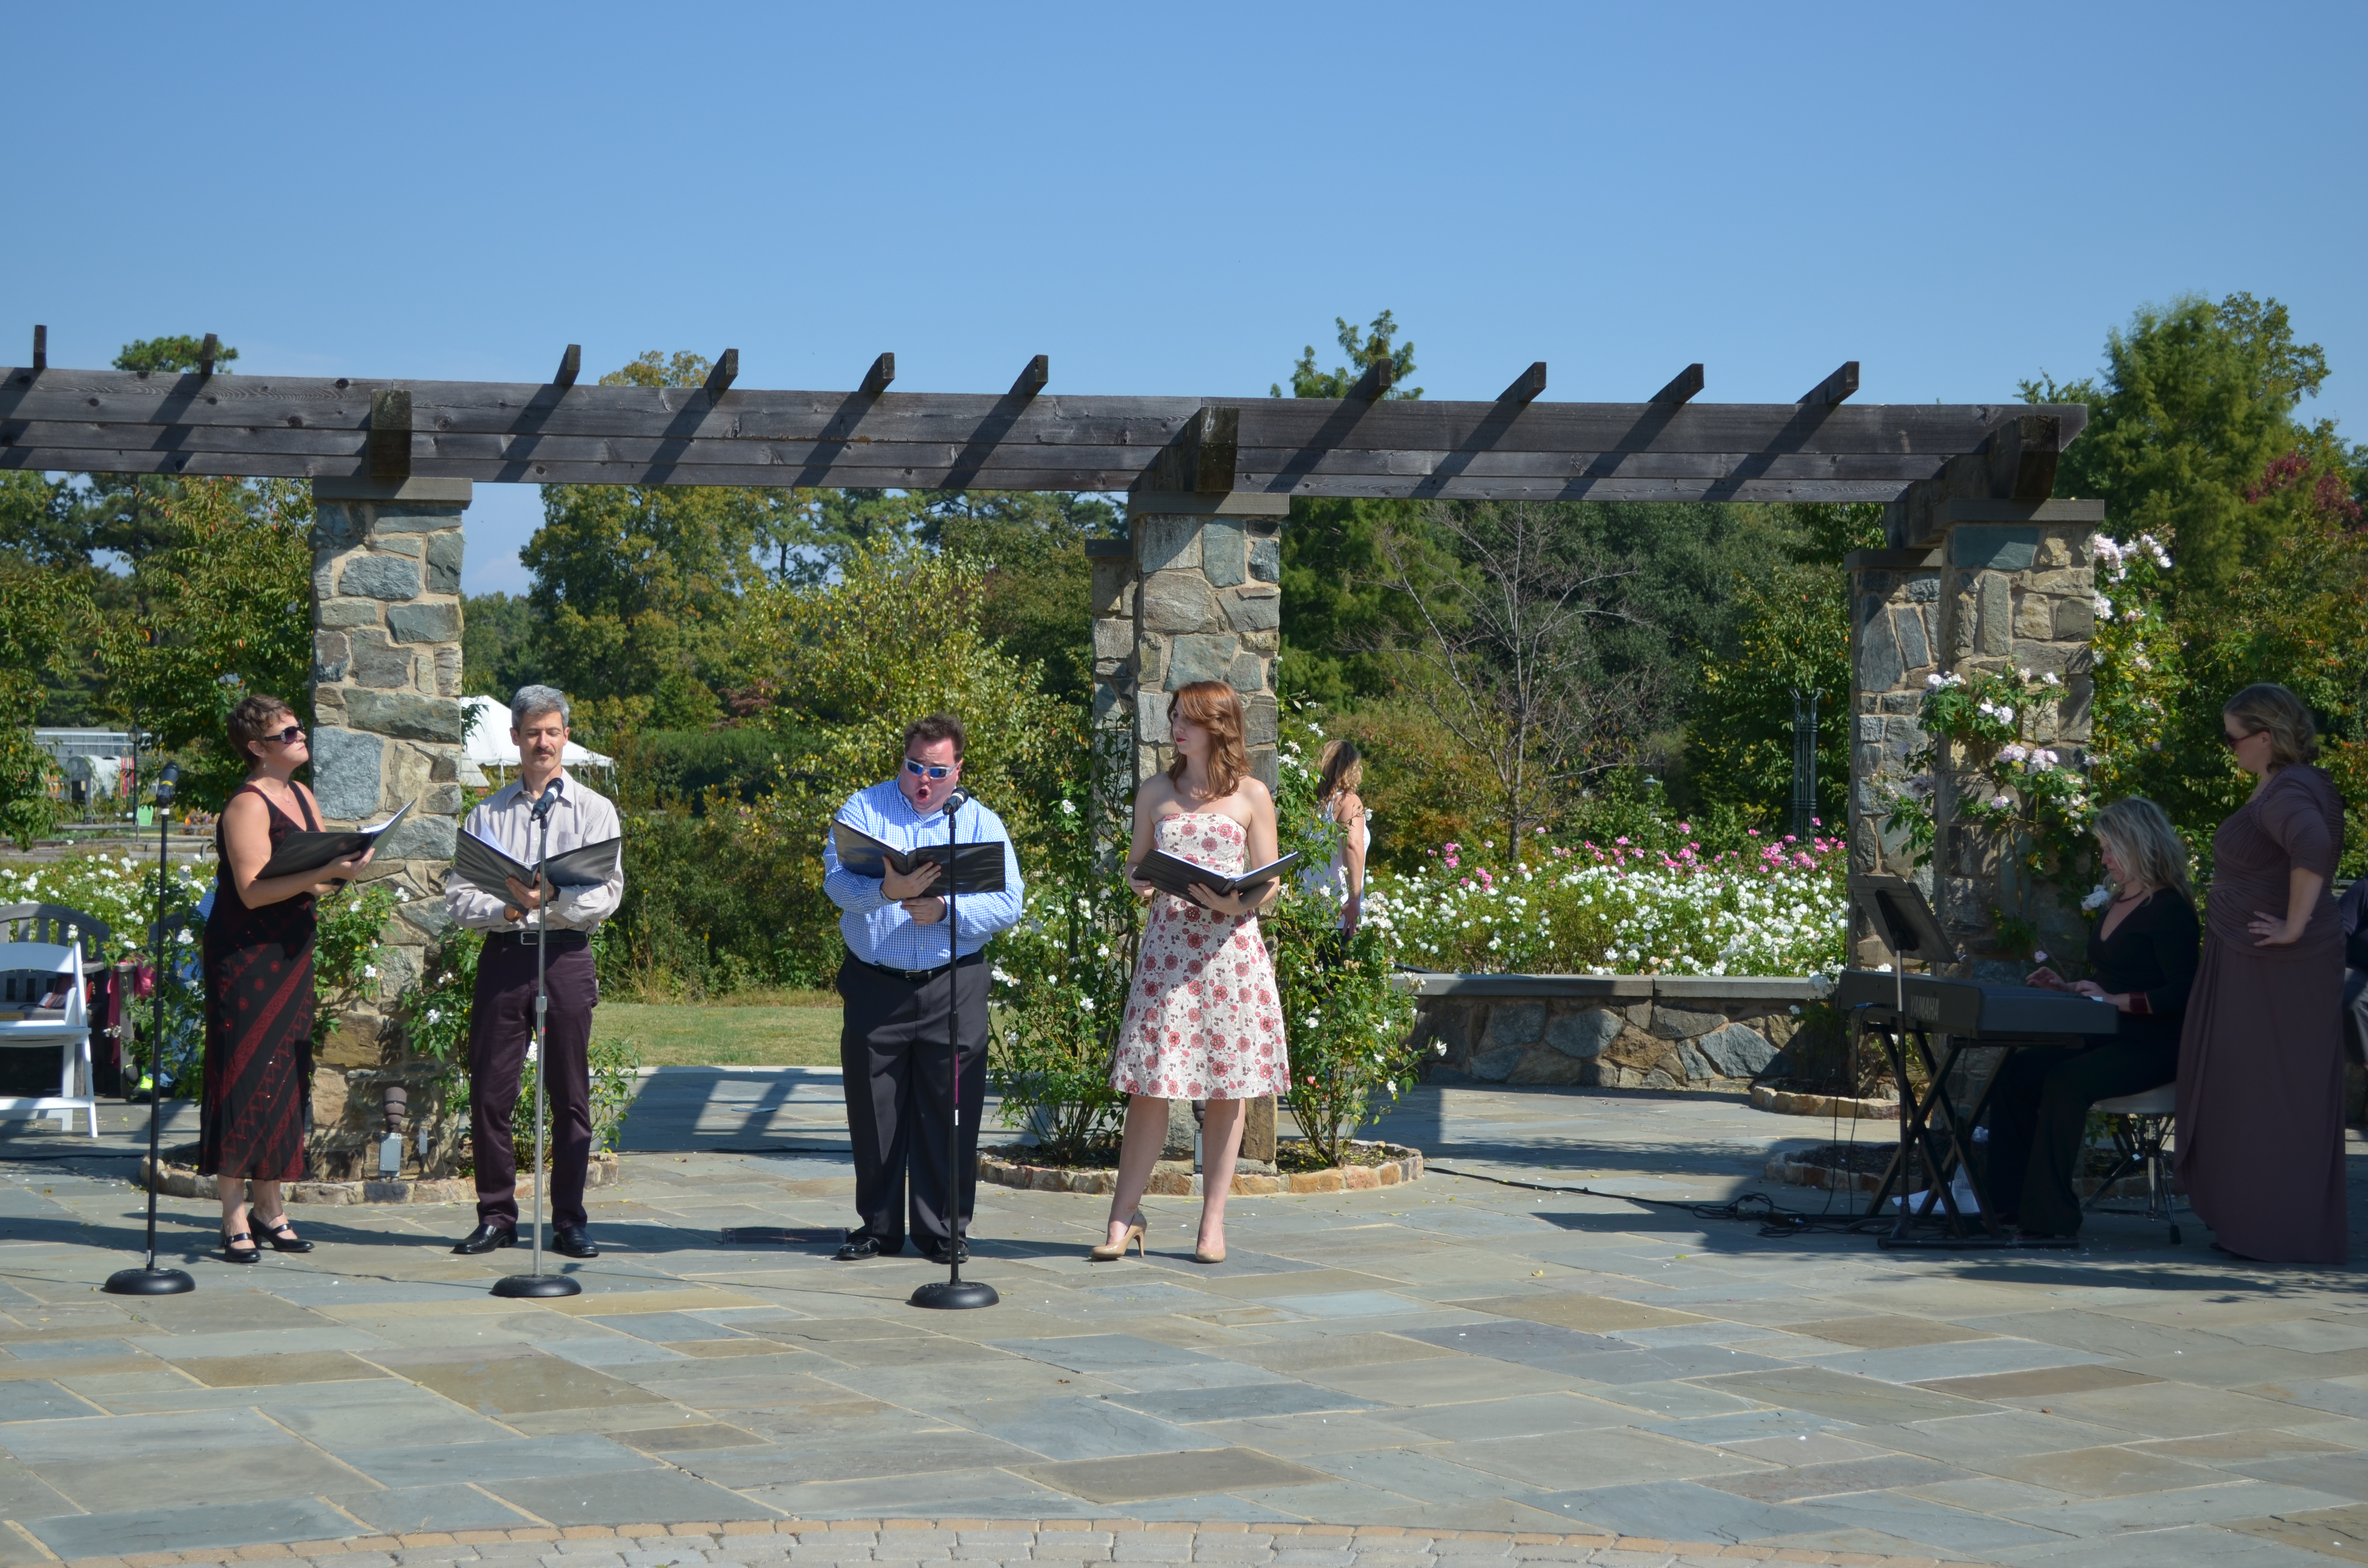 Capitol Opera Richmond in The Rose Garden at Lewis Ginter Botanical Garden